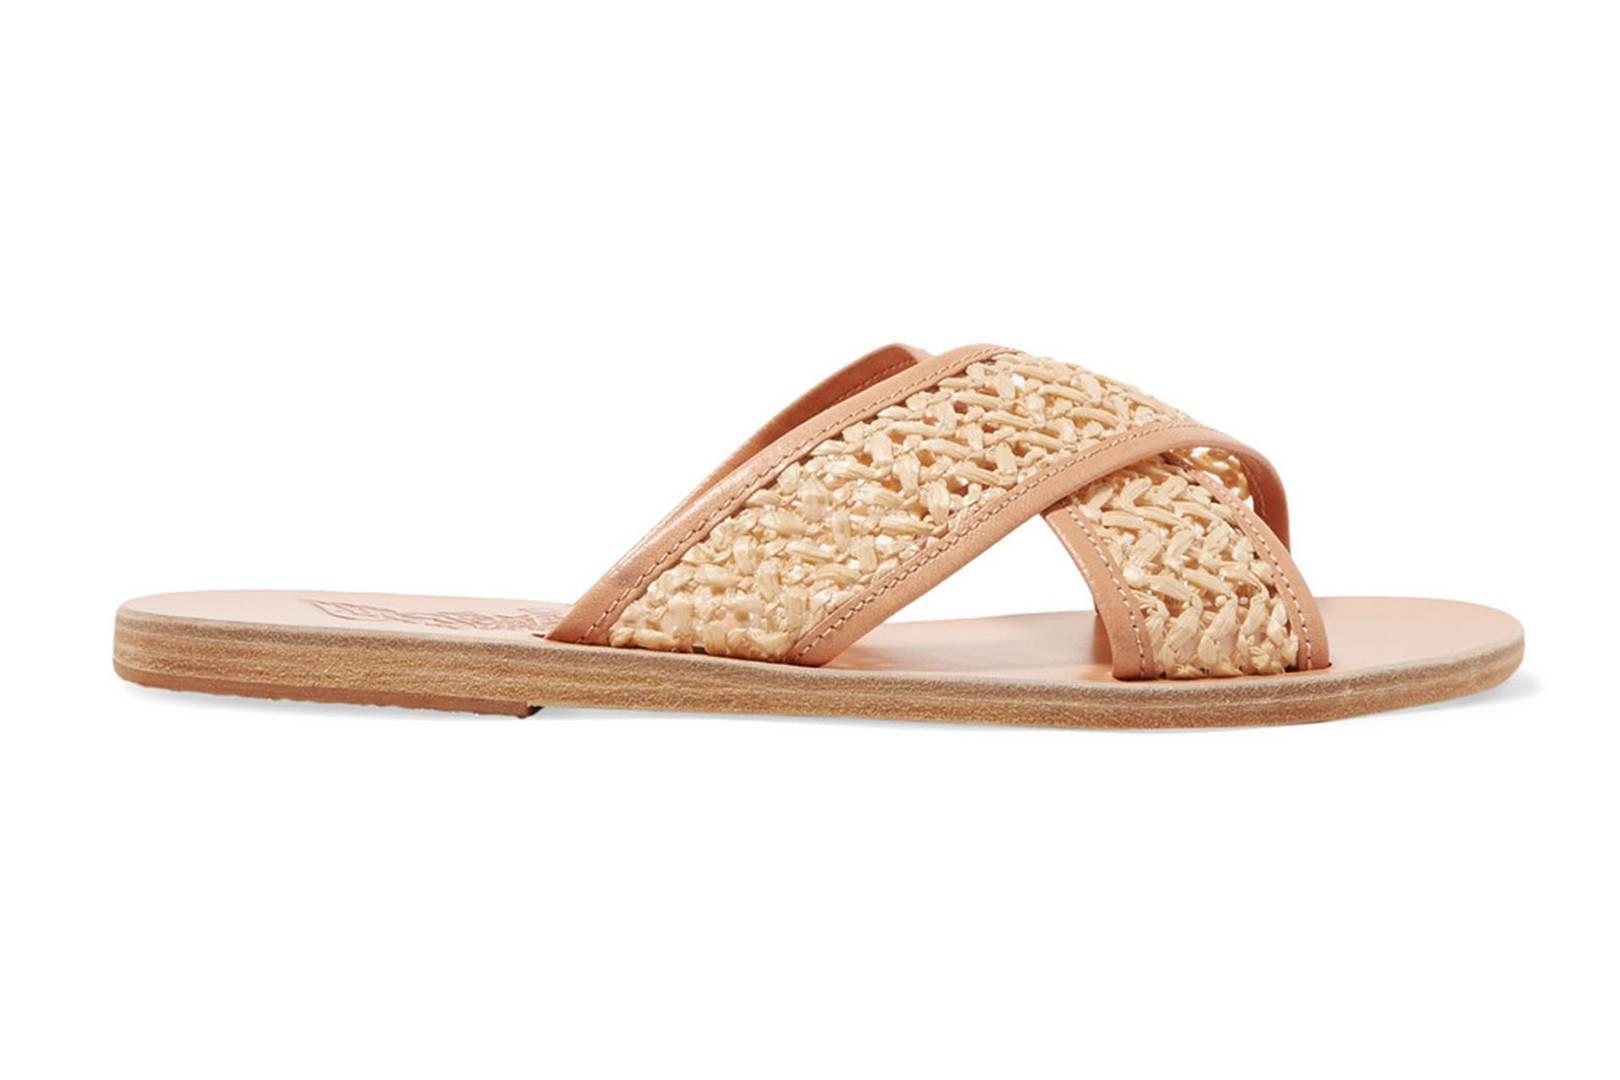 282db3451 Best Women s Sandals for Summer 2018